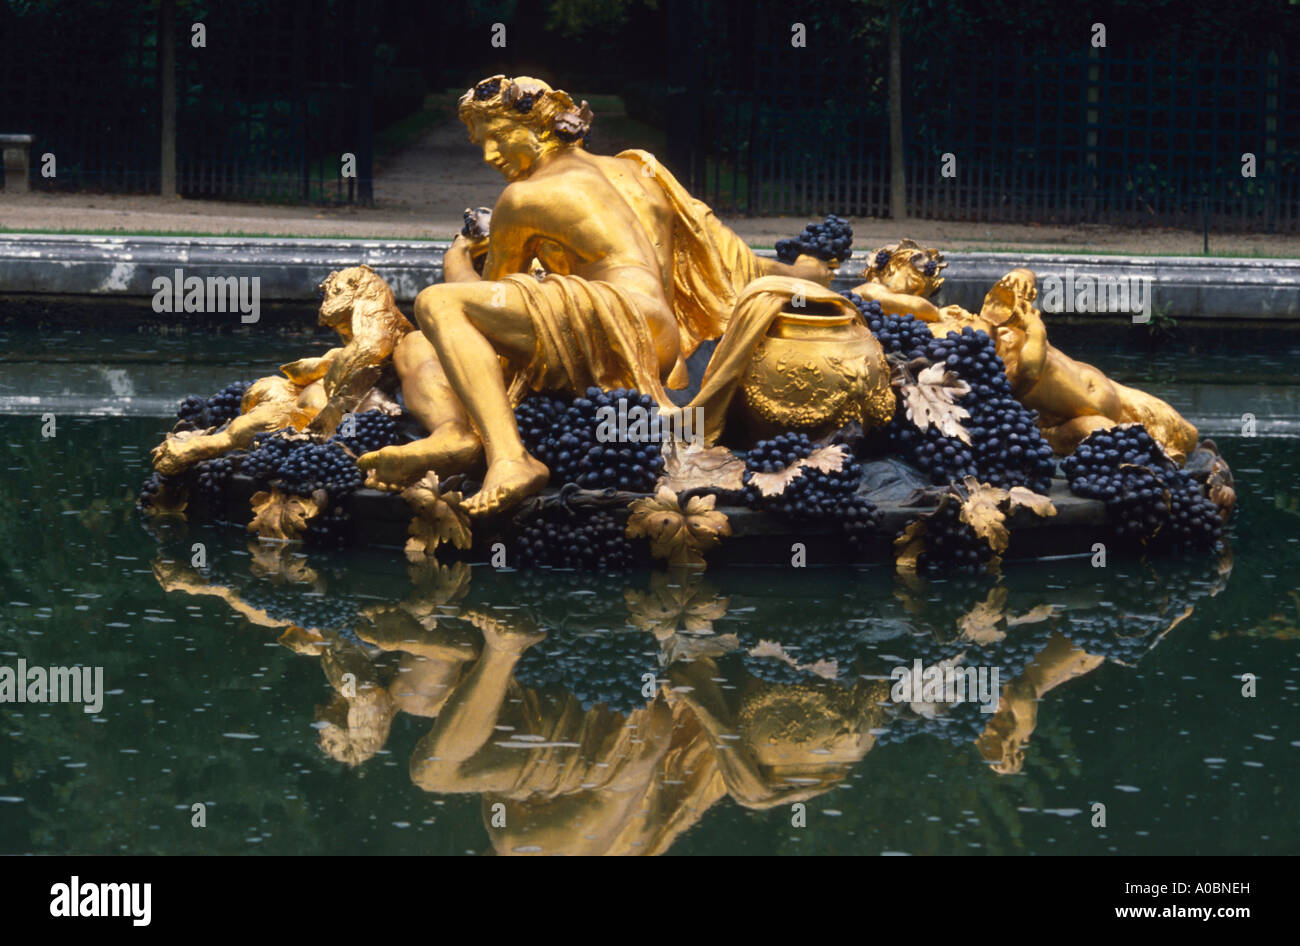 Schloss Versailles brunnen vergoldete Skulpturen Frankreich - Stock Image